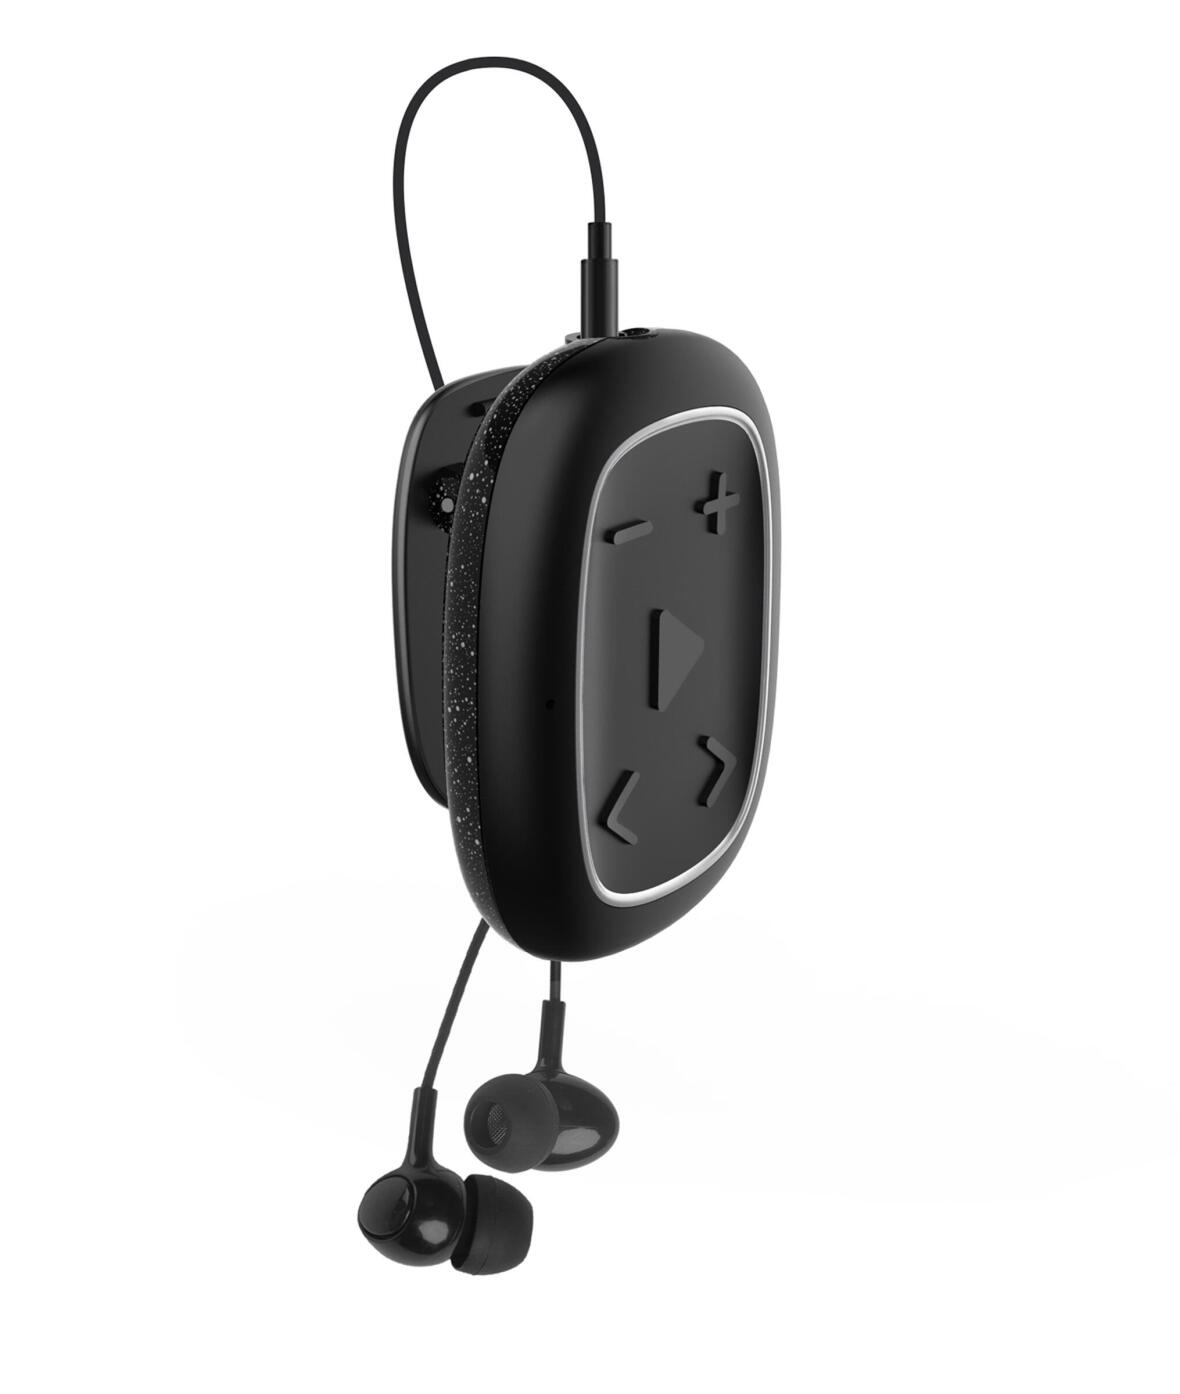 Kalenji MP3